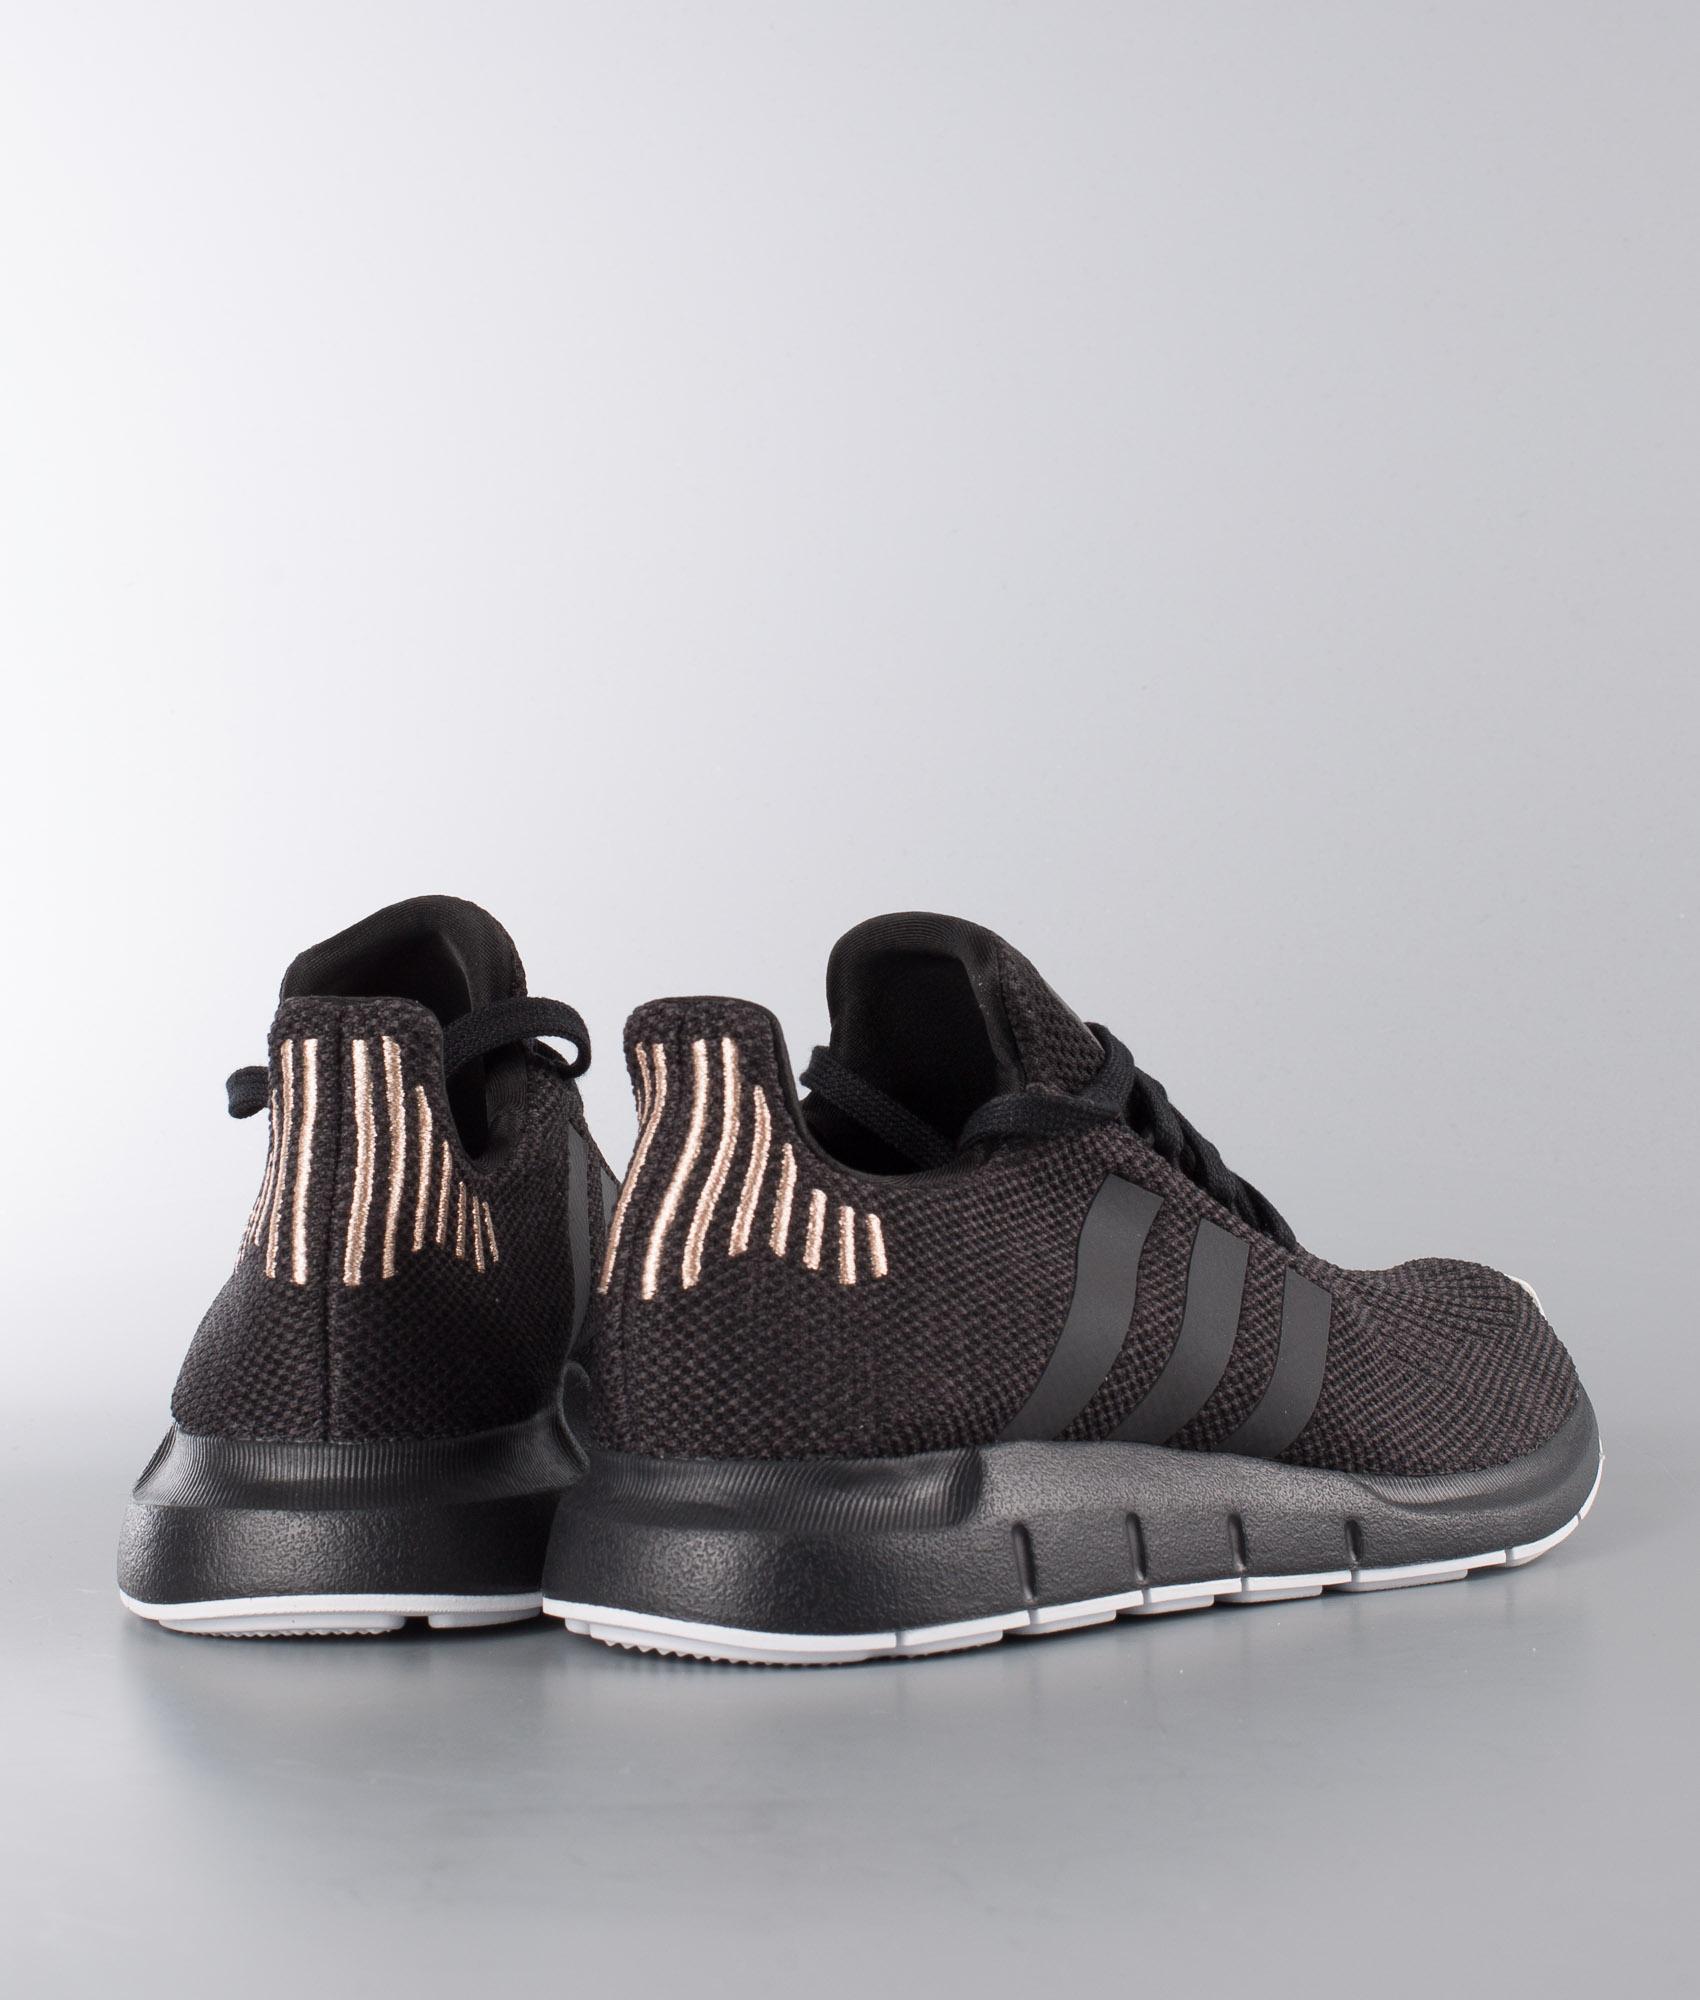 Originals Blackcarbonftwr W Core White Swift Shoes Run Adidas xHd7fRx